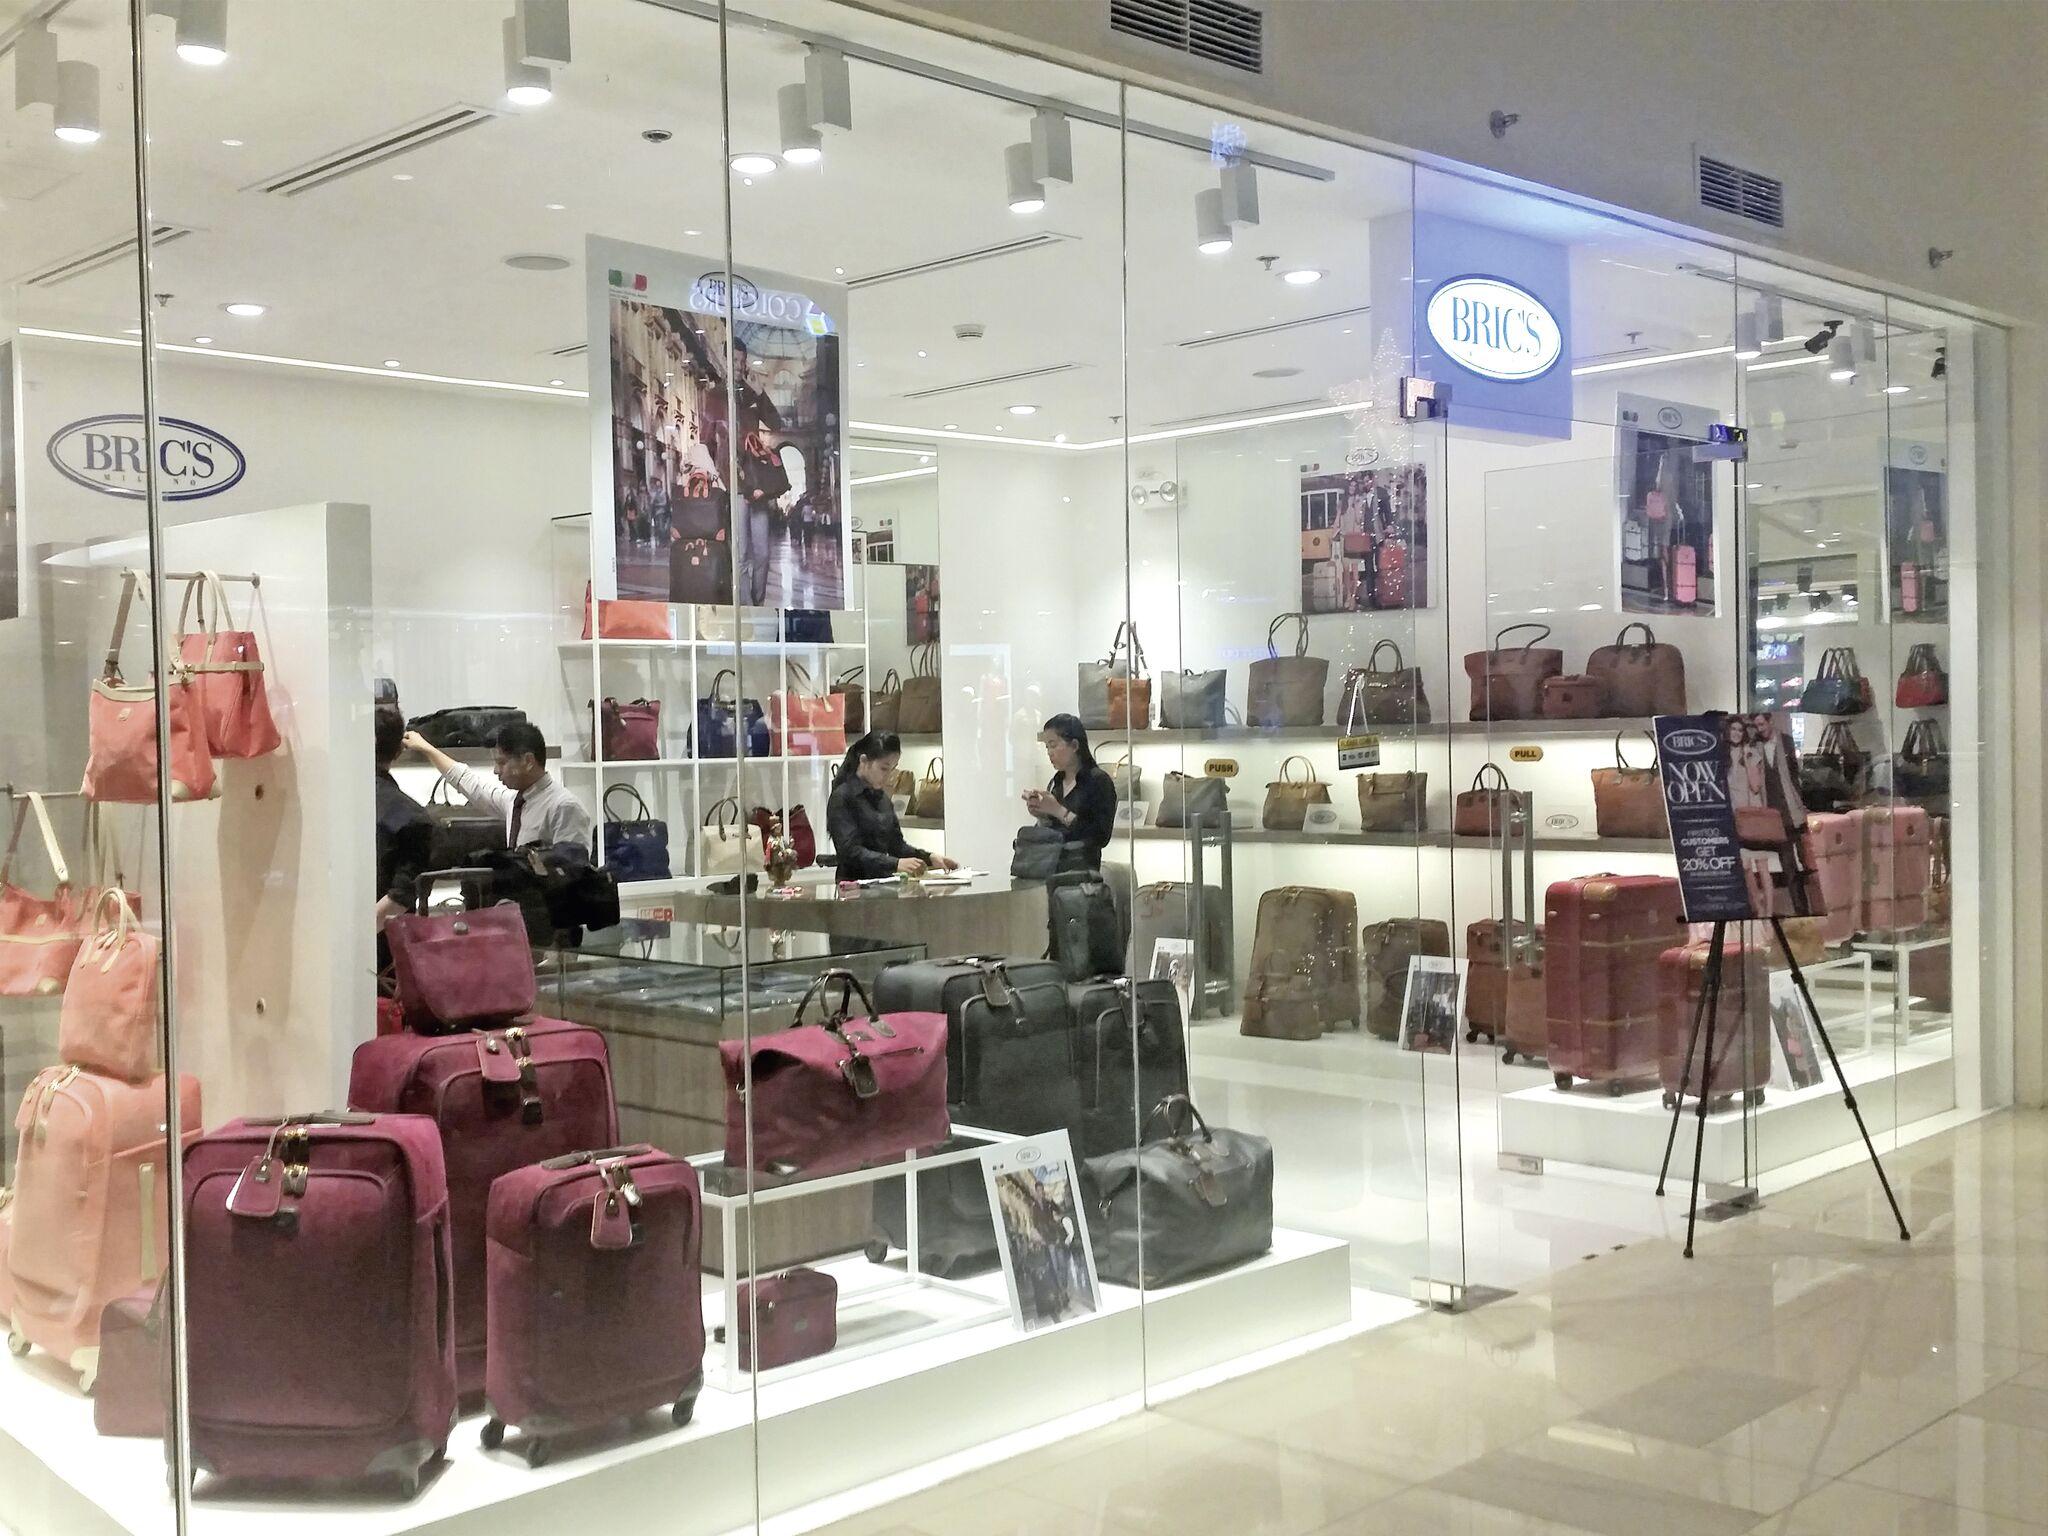 BRIC'S Travel Bag Store